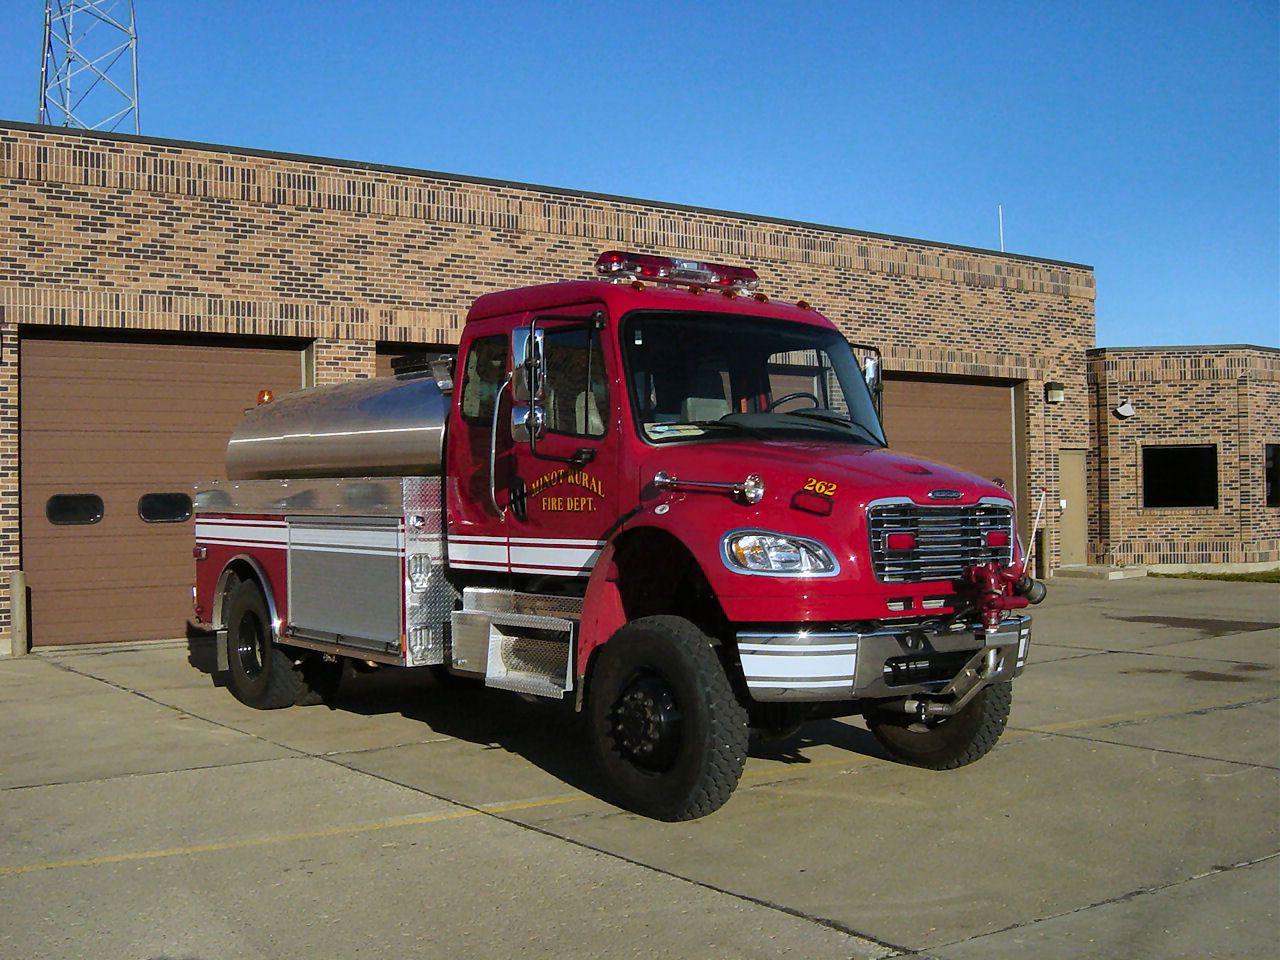 Chevrolet suburban command arcadia fire department emergency apparatus fire truck photo my future ic vehicles pinterest fire trucks fire apparatus